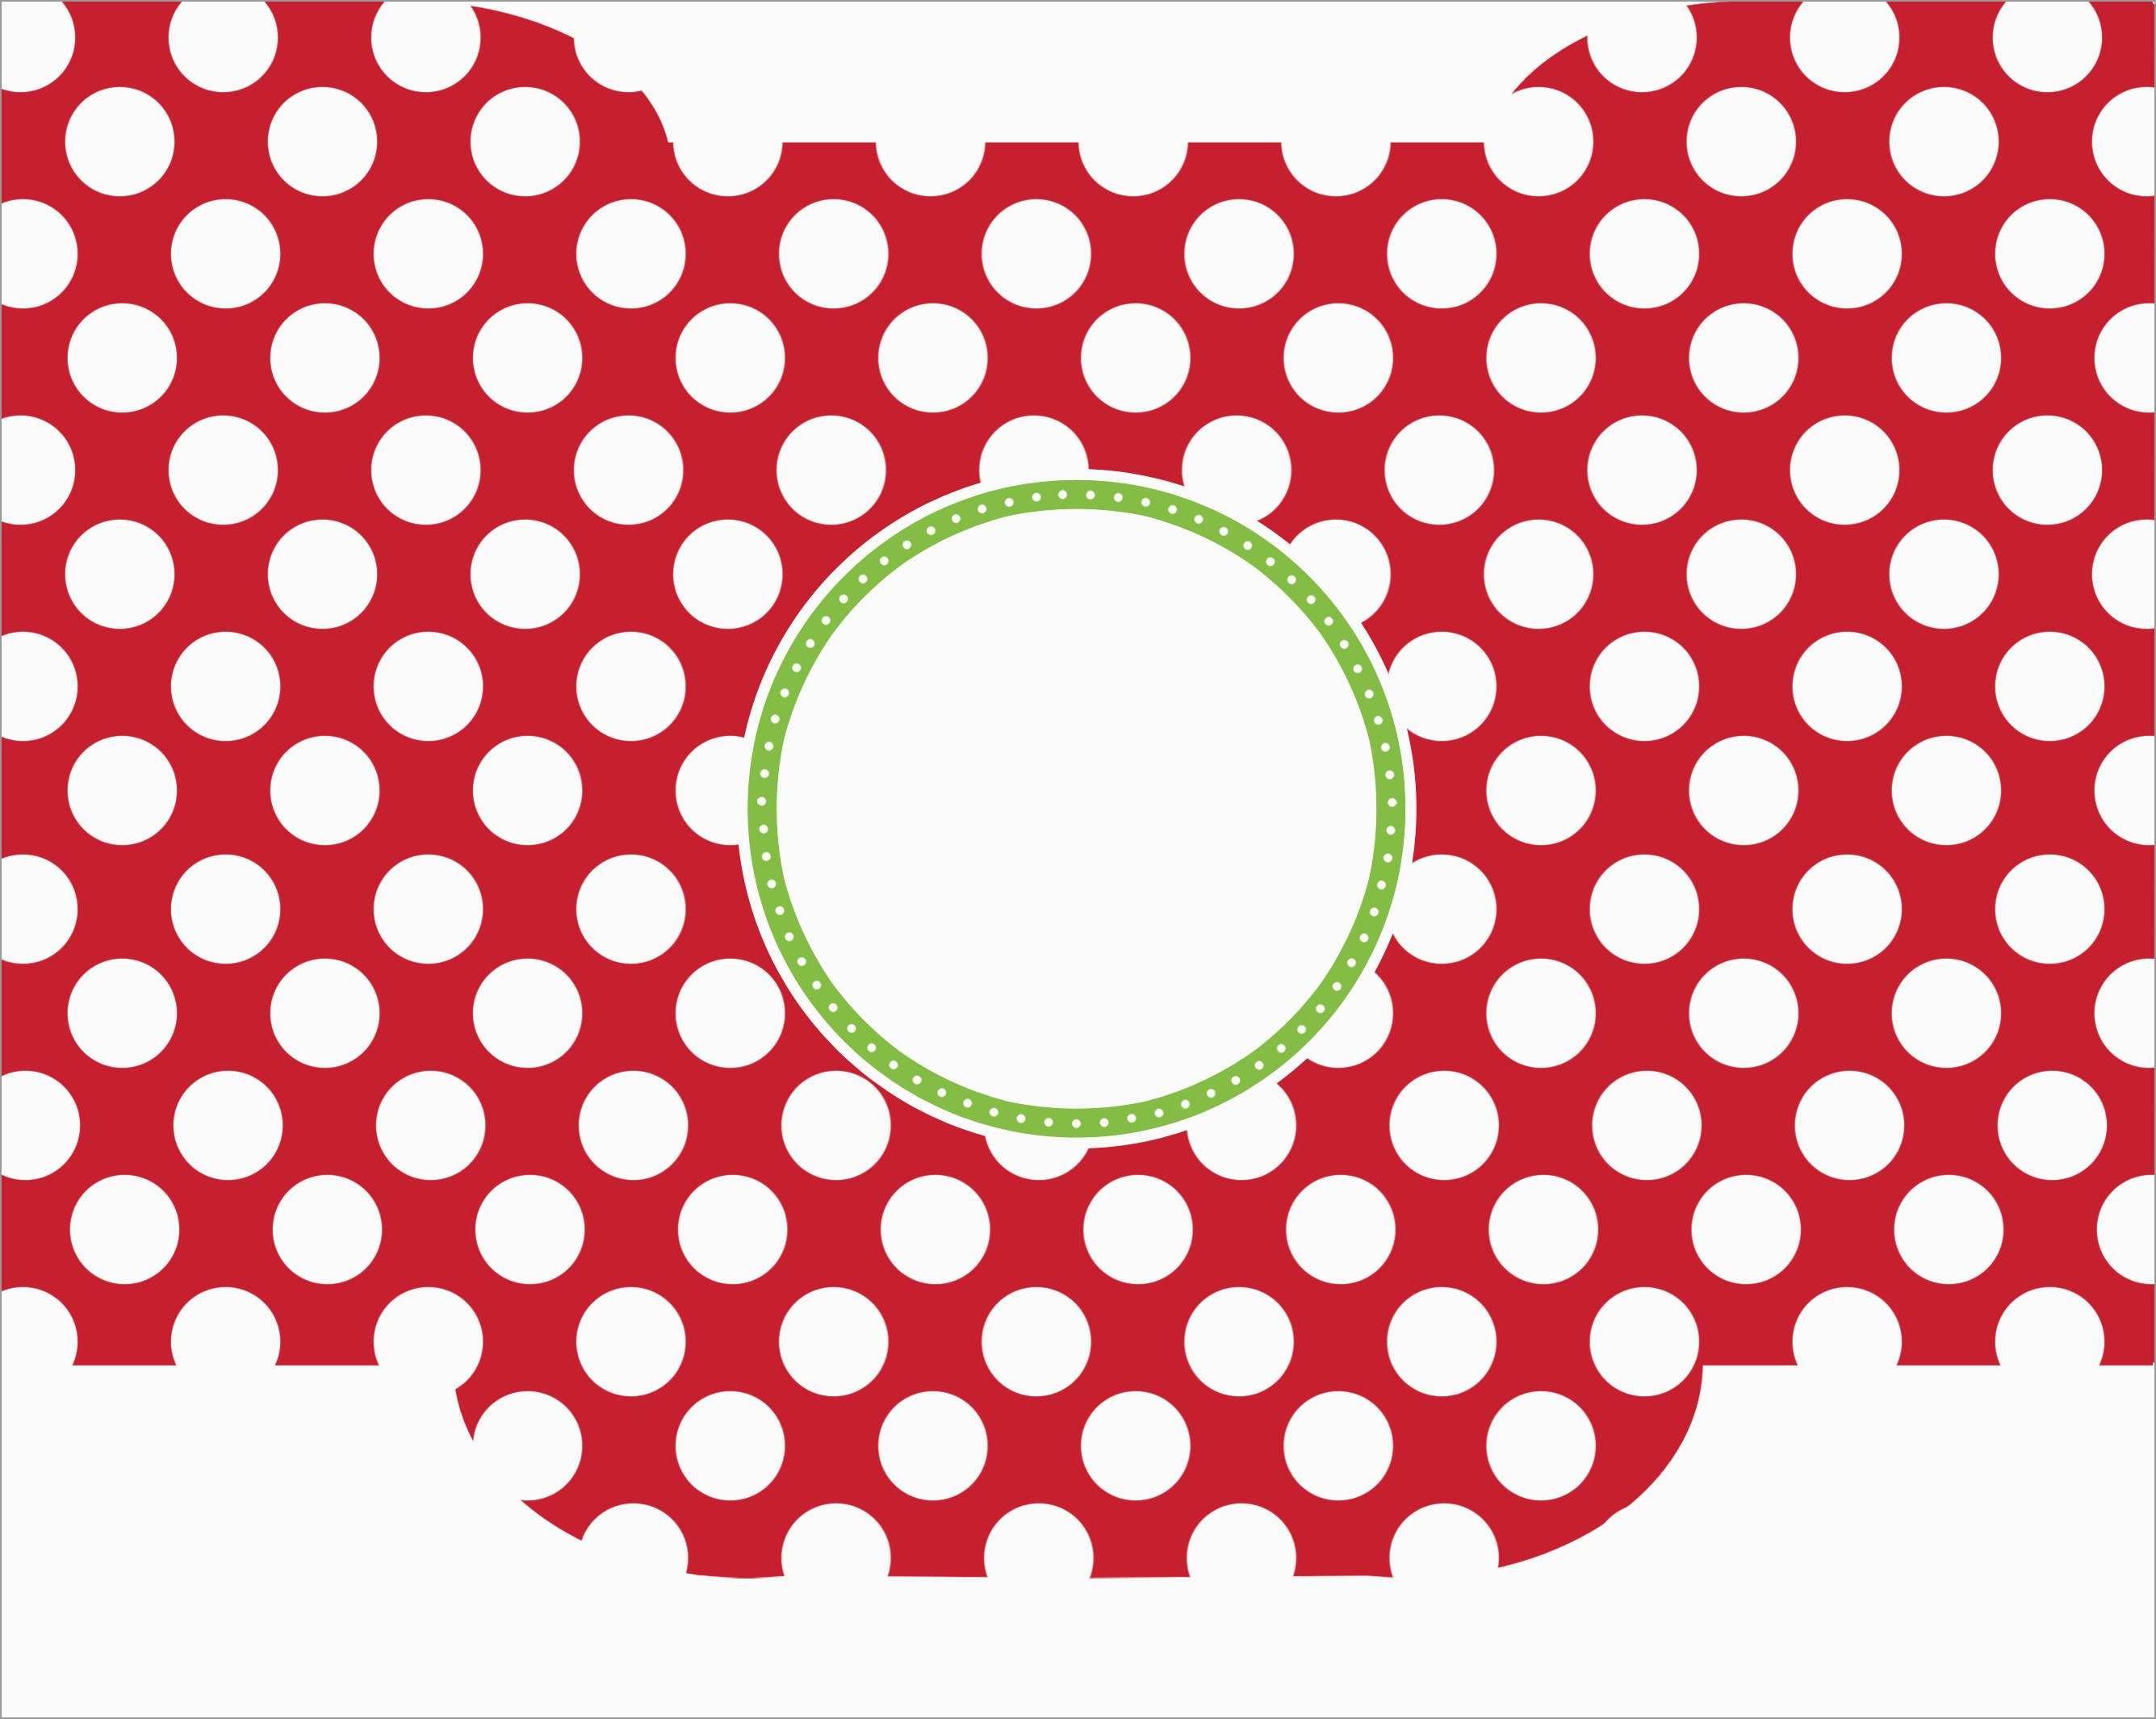 Elegant Gift Card Envelope Template Free | Best Of Template - Free Printable Christmas Gift Card Envelopes